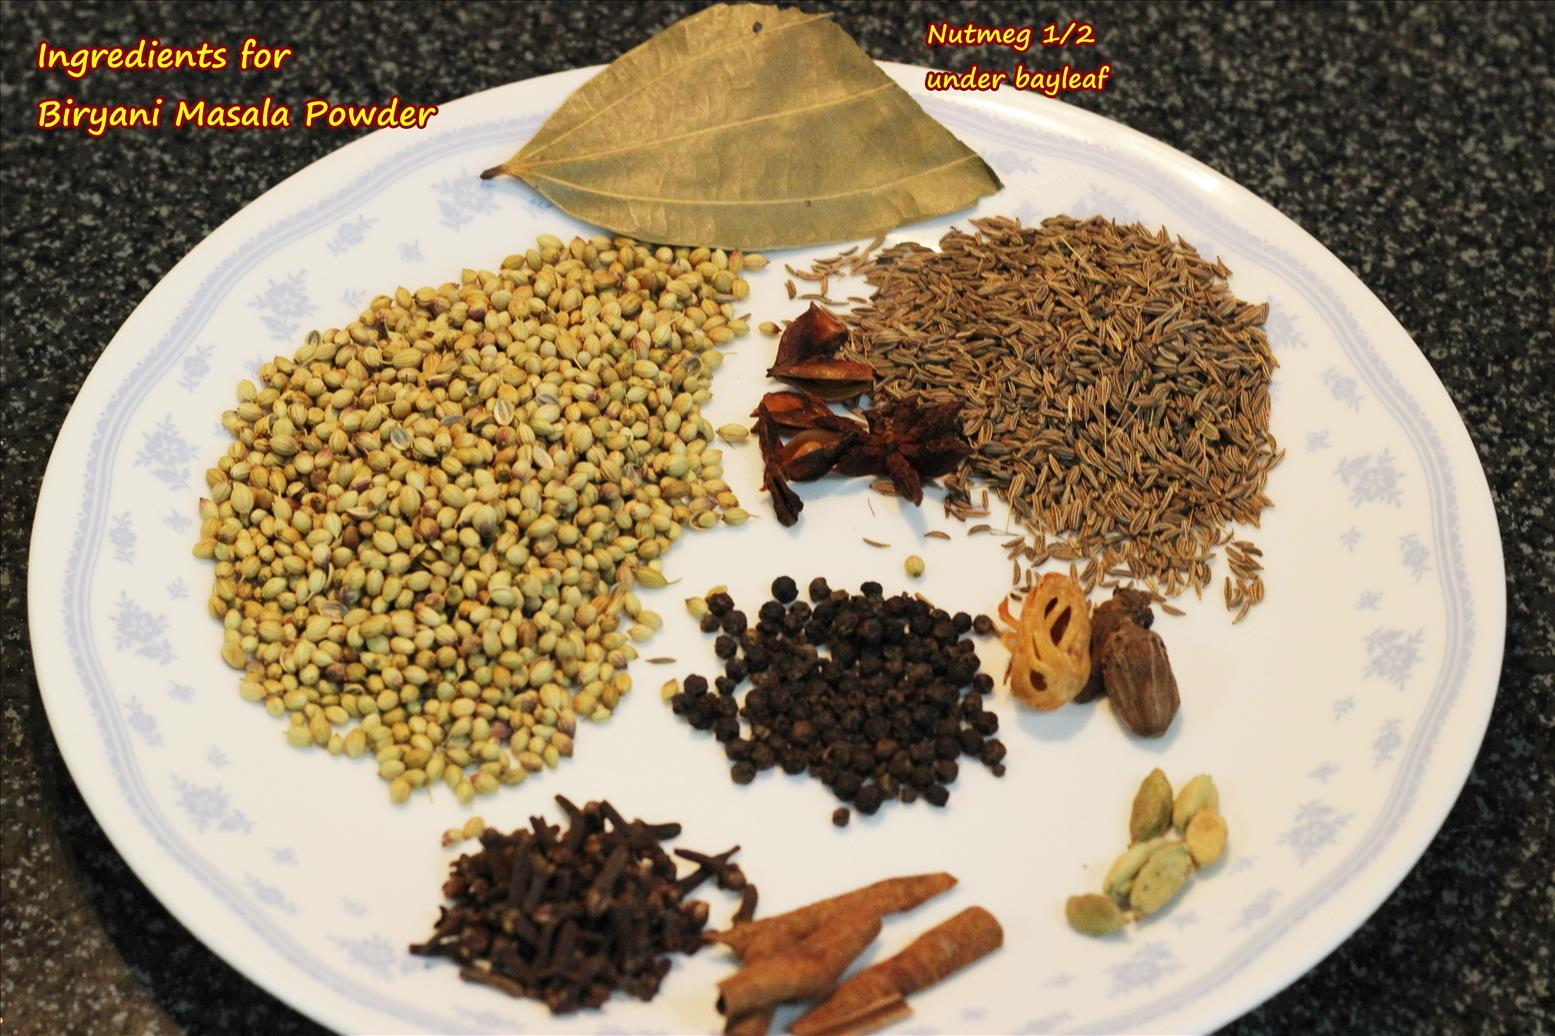 Biryani masala powder recipe how to make biryani masala powder - Garam masala recette ...